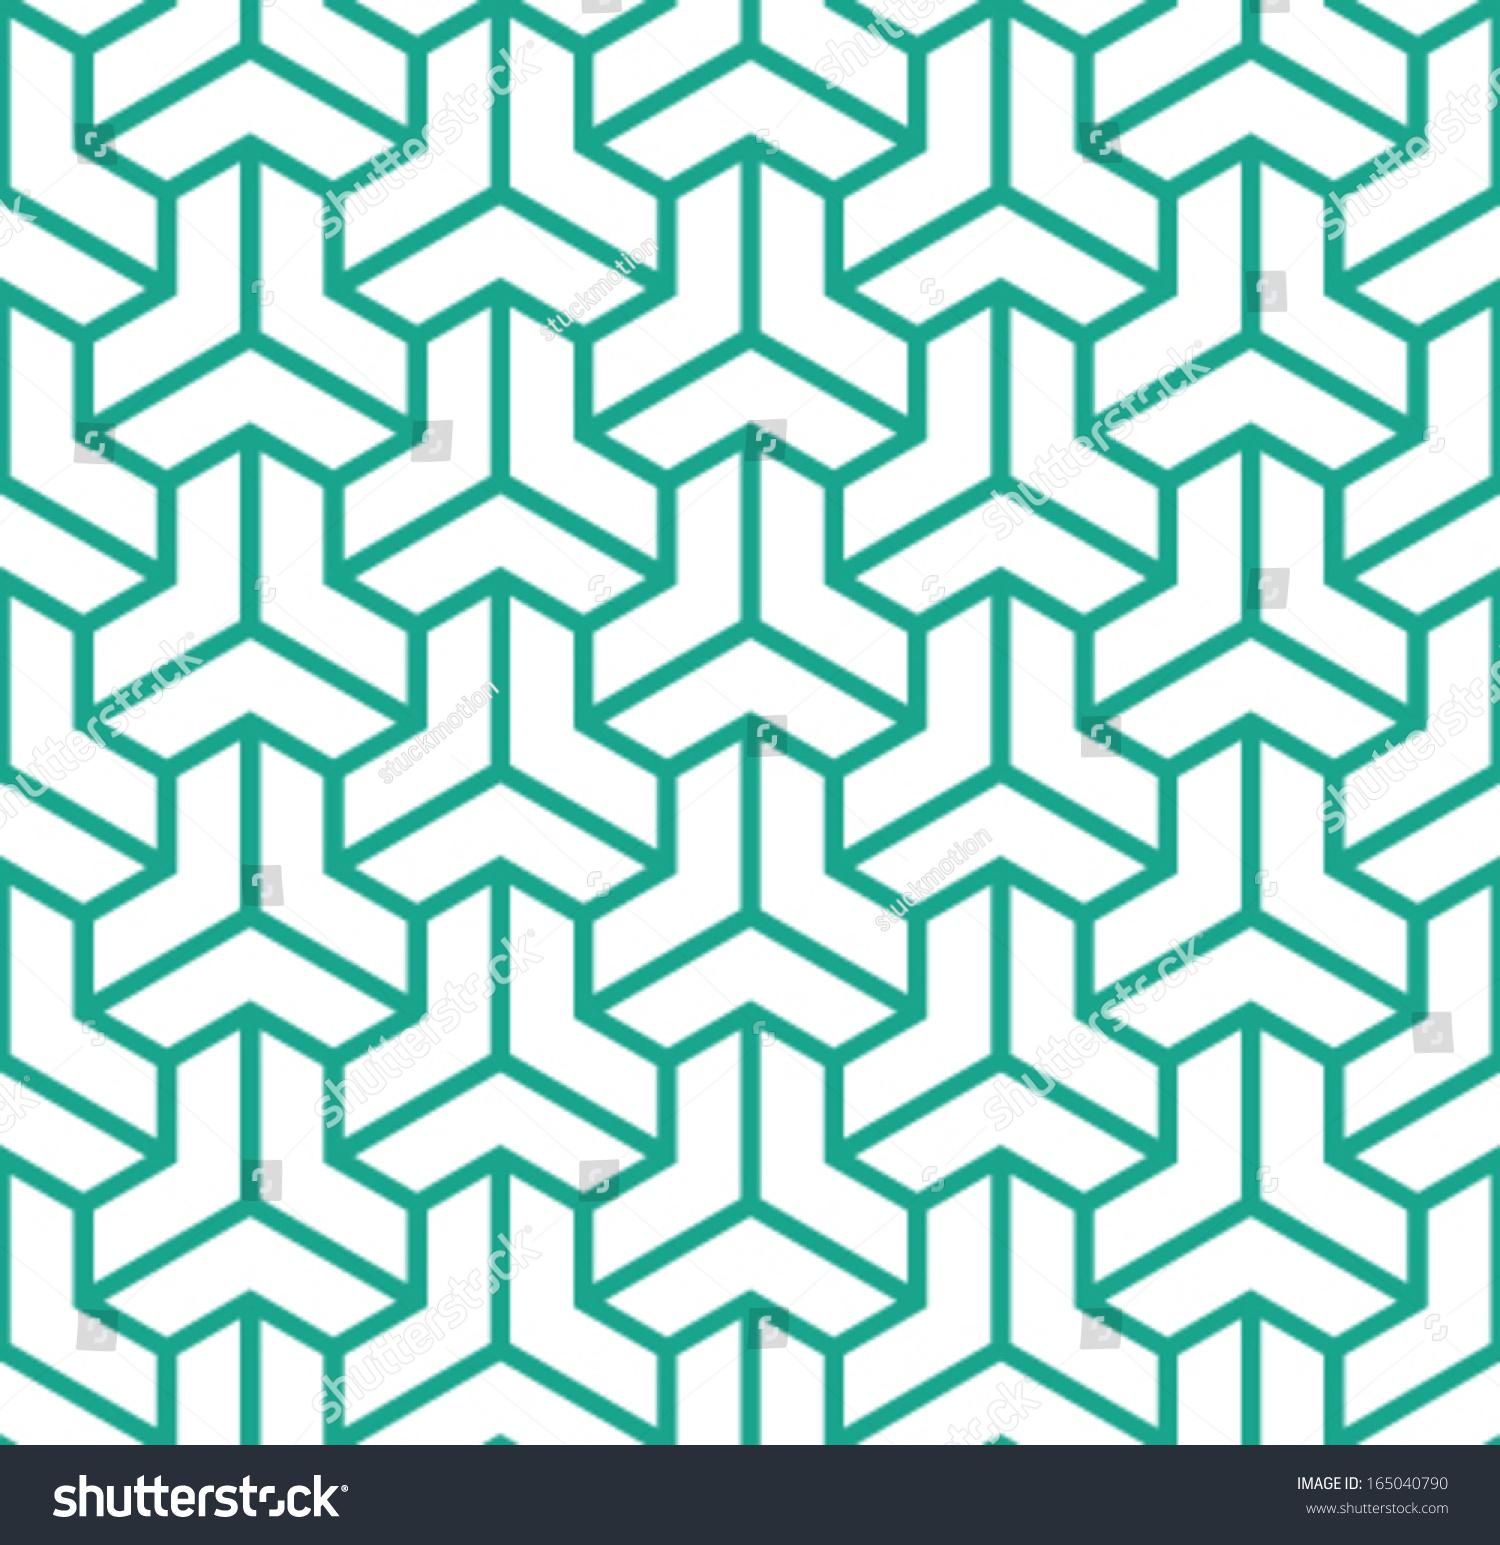 cube print out - Ecosia